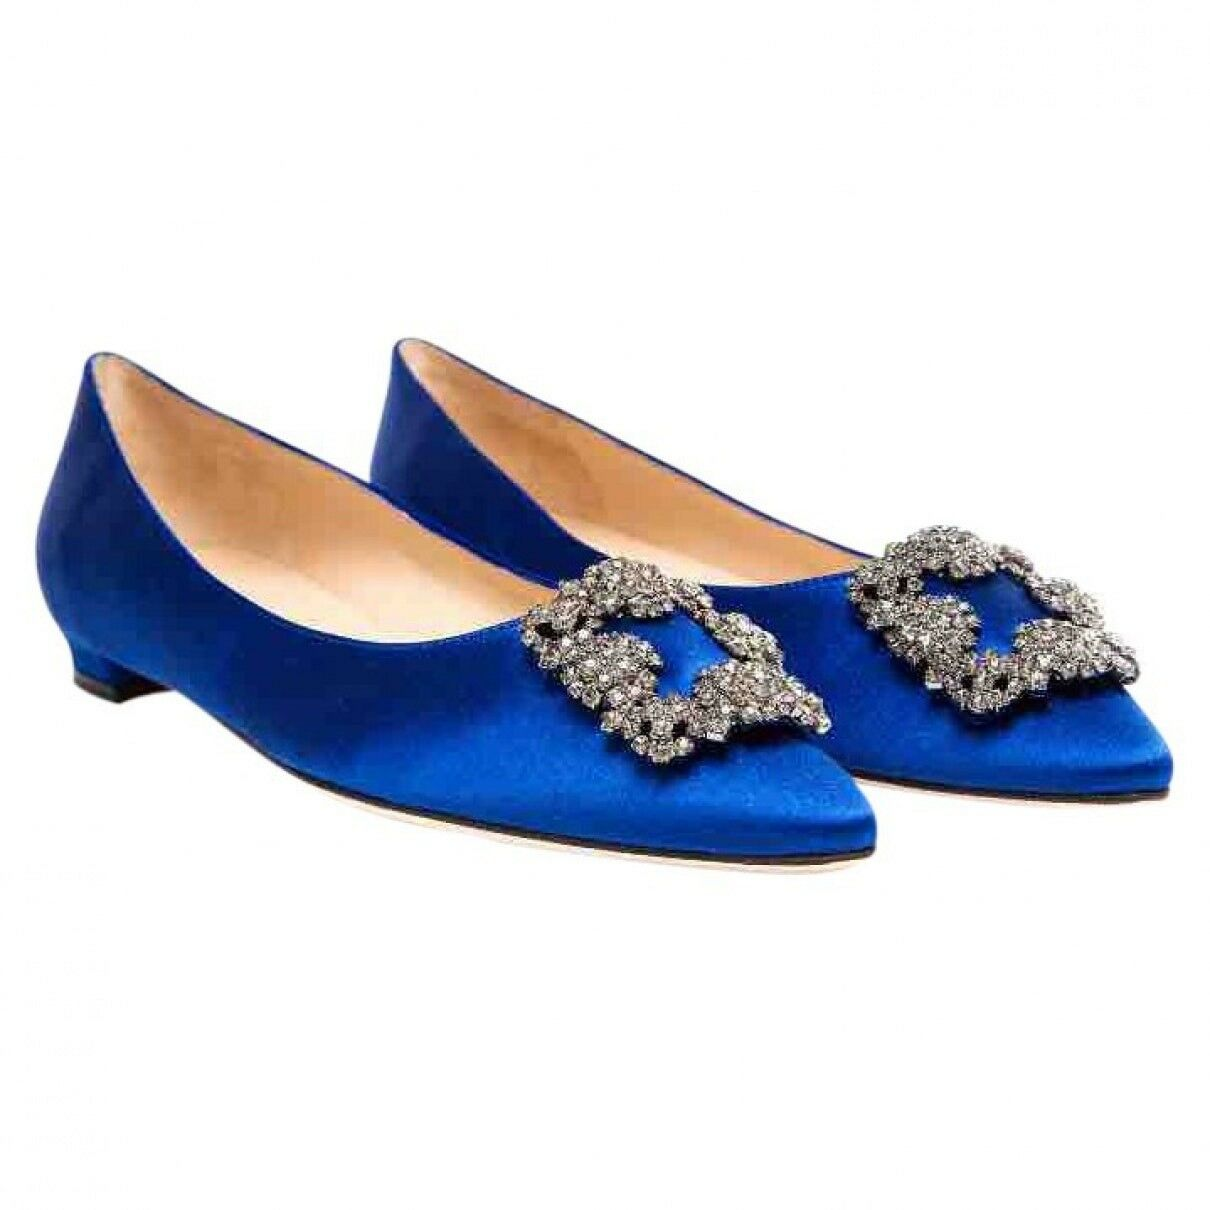 NUOVO CON SCATOLA Manolo Blahnik hangisi Royal Blue Crystal Flats 36.5